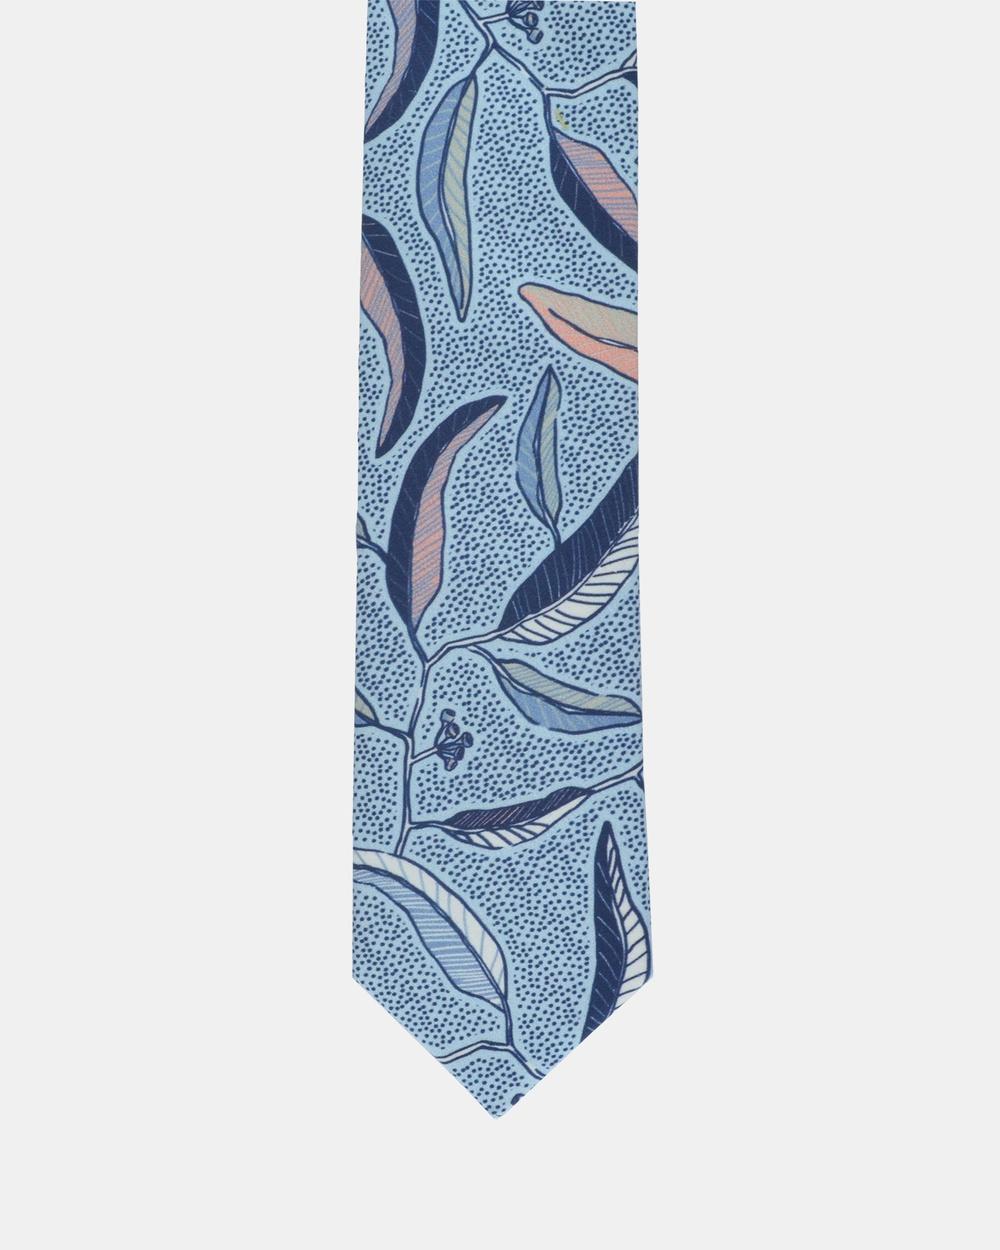 Peggy and Finn Eucalyptus Tie Ties Blue Australia